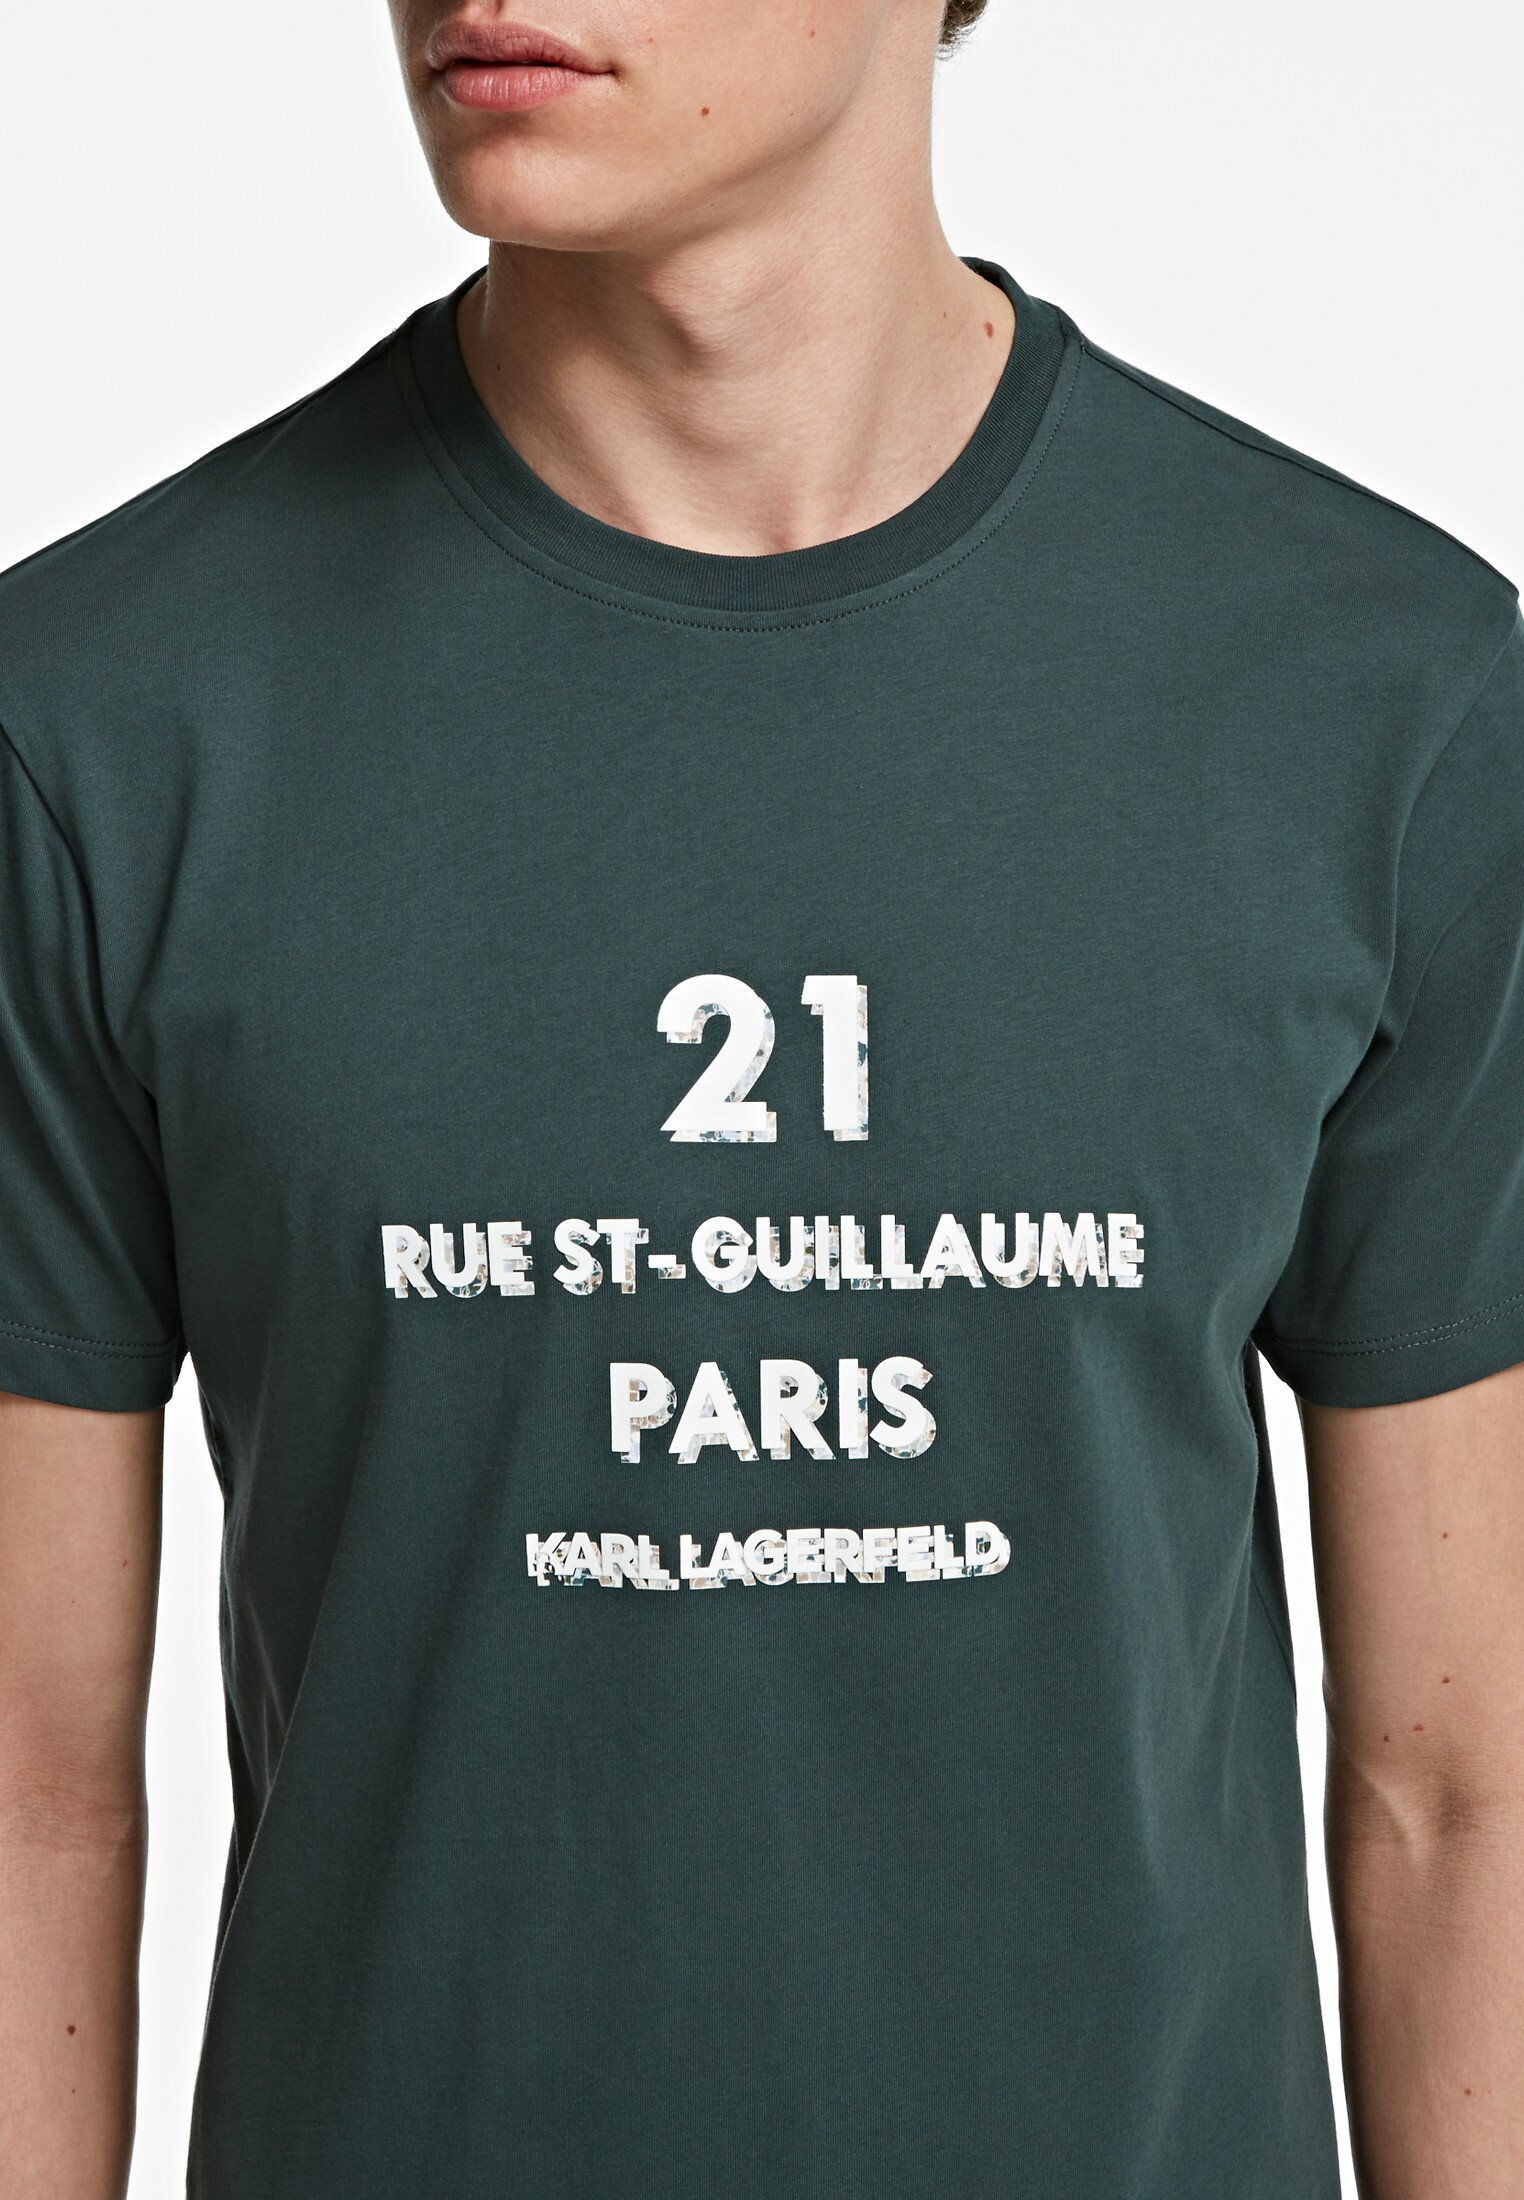 KARL LAGERFELD ADDRESS LOGO  - T-Shirt print - green gable/dunkelgrün - Herrenbekleidung 4AqtP